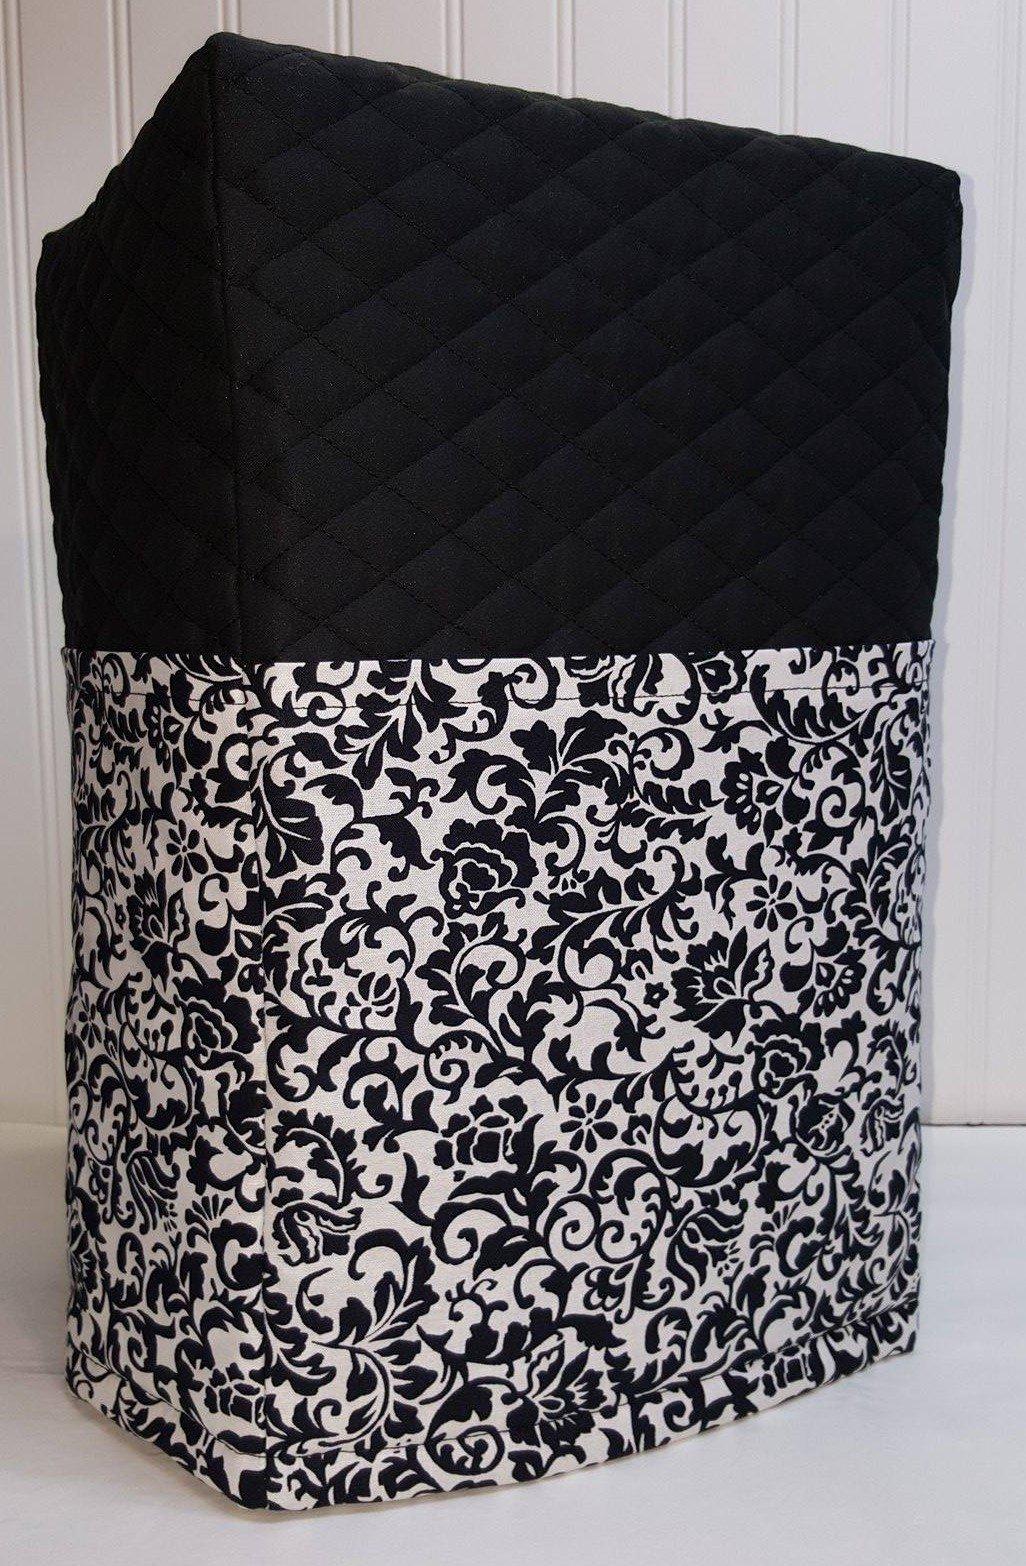 Black & White Floral Damask Bread Machine Cover (Black)